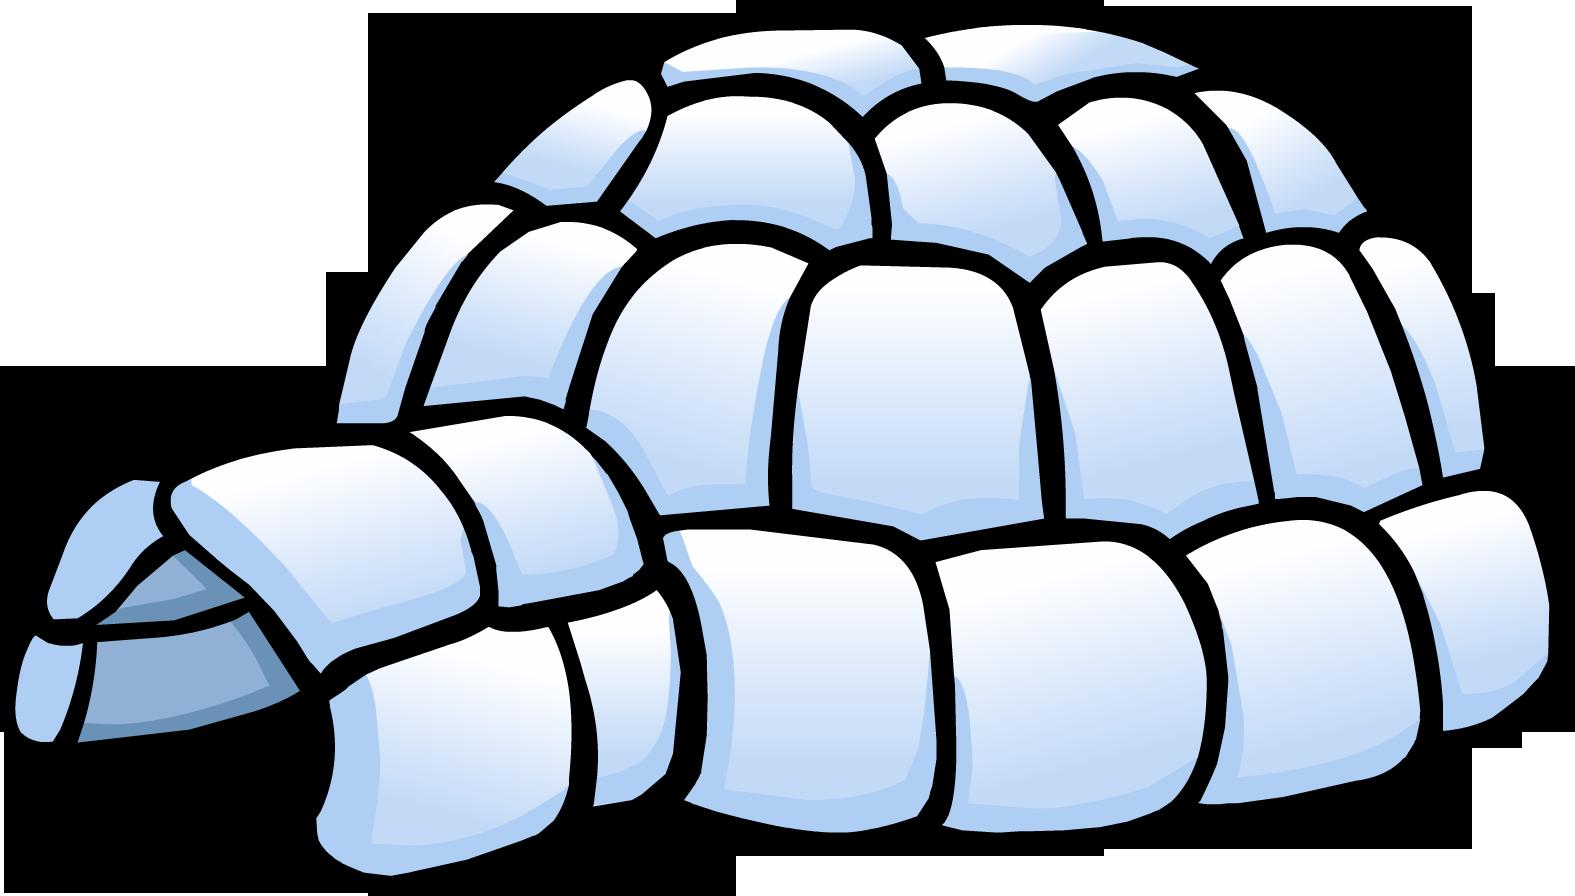 Puffle Igloo | Club Penguin Wiki | FANDOM powered by Wikia